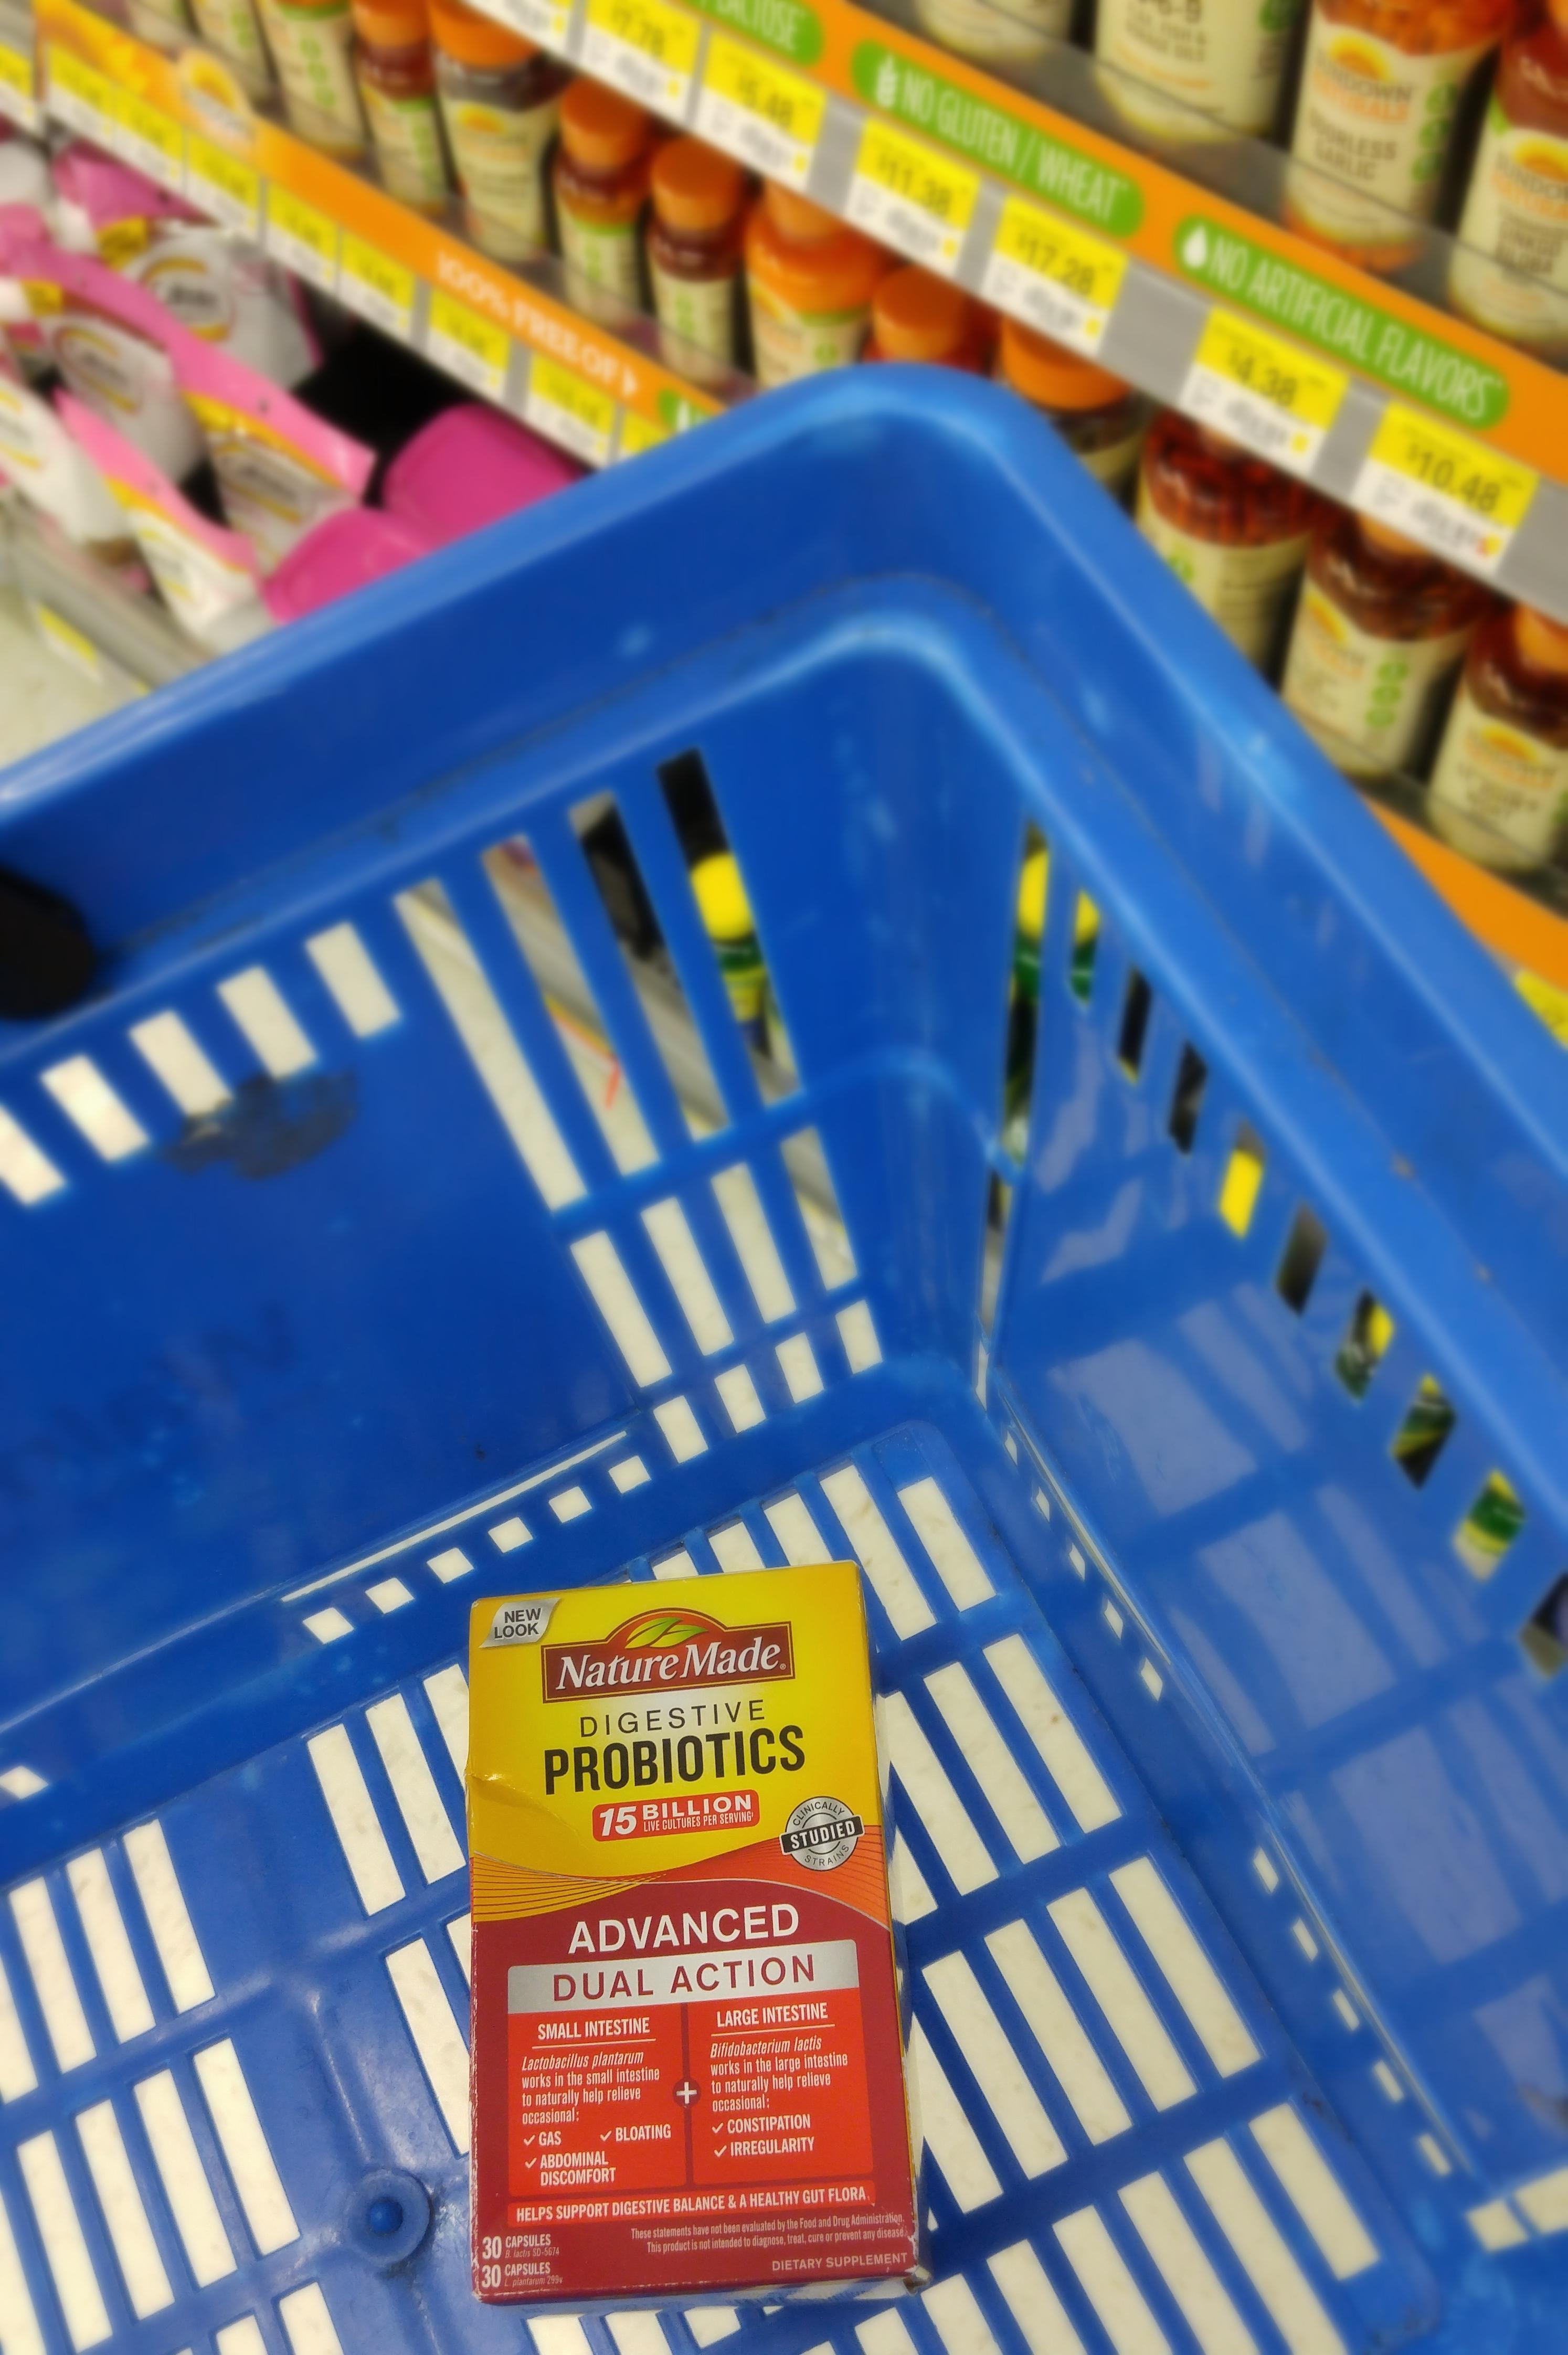 Nature Made Probiotics Walmart